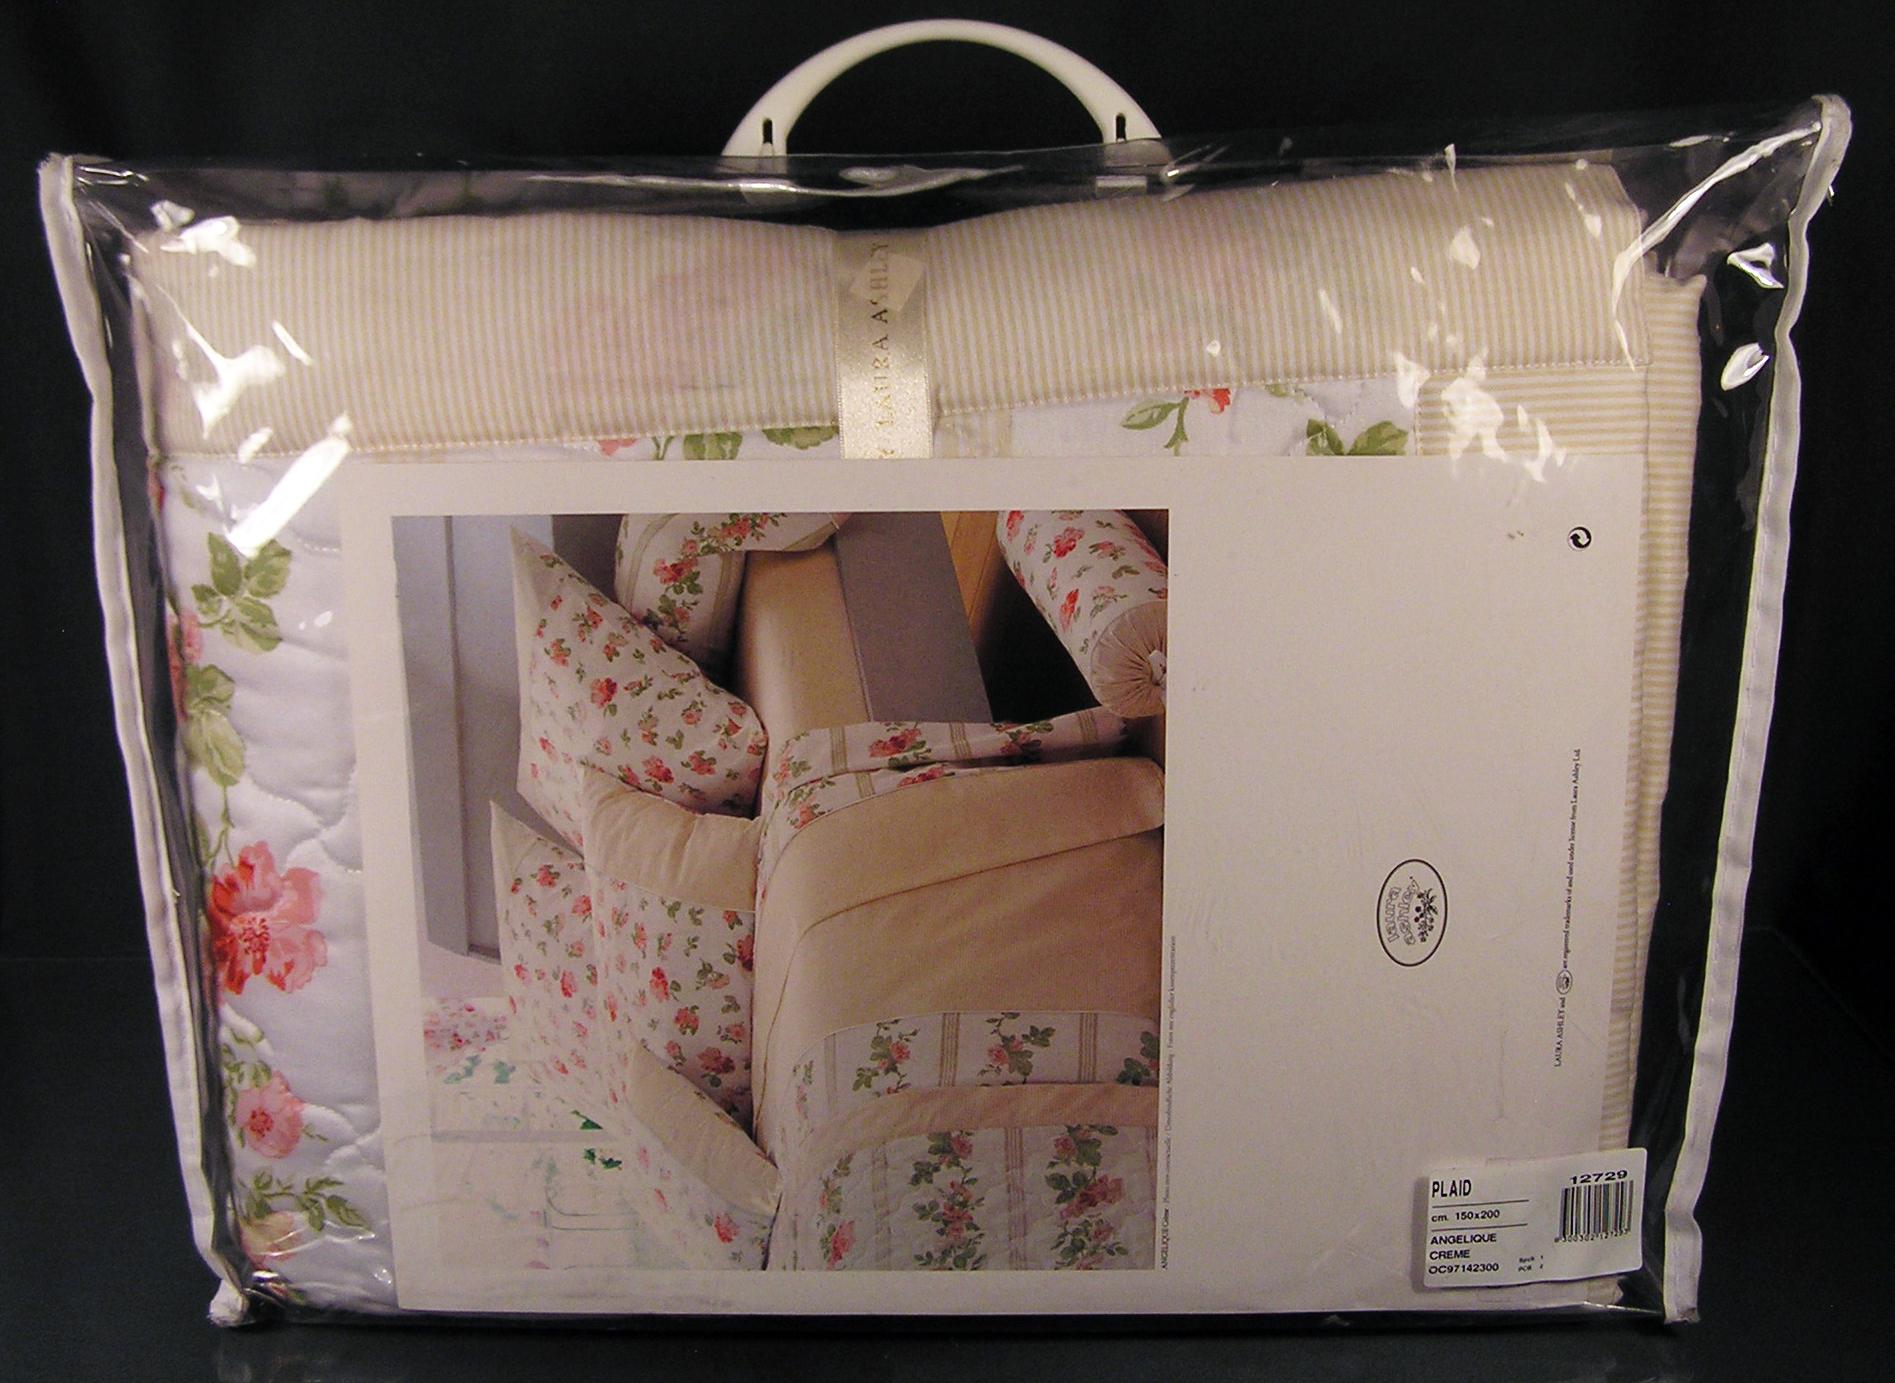 laura ashley angeliqu creme bett berwurf 150 x 200 cm einzelbett tagesdecke neu ebay. Black Bedroom Furniture Sets. Home Design Ideas